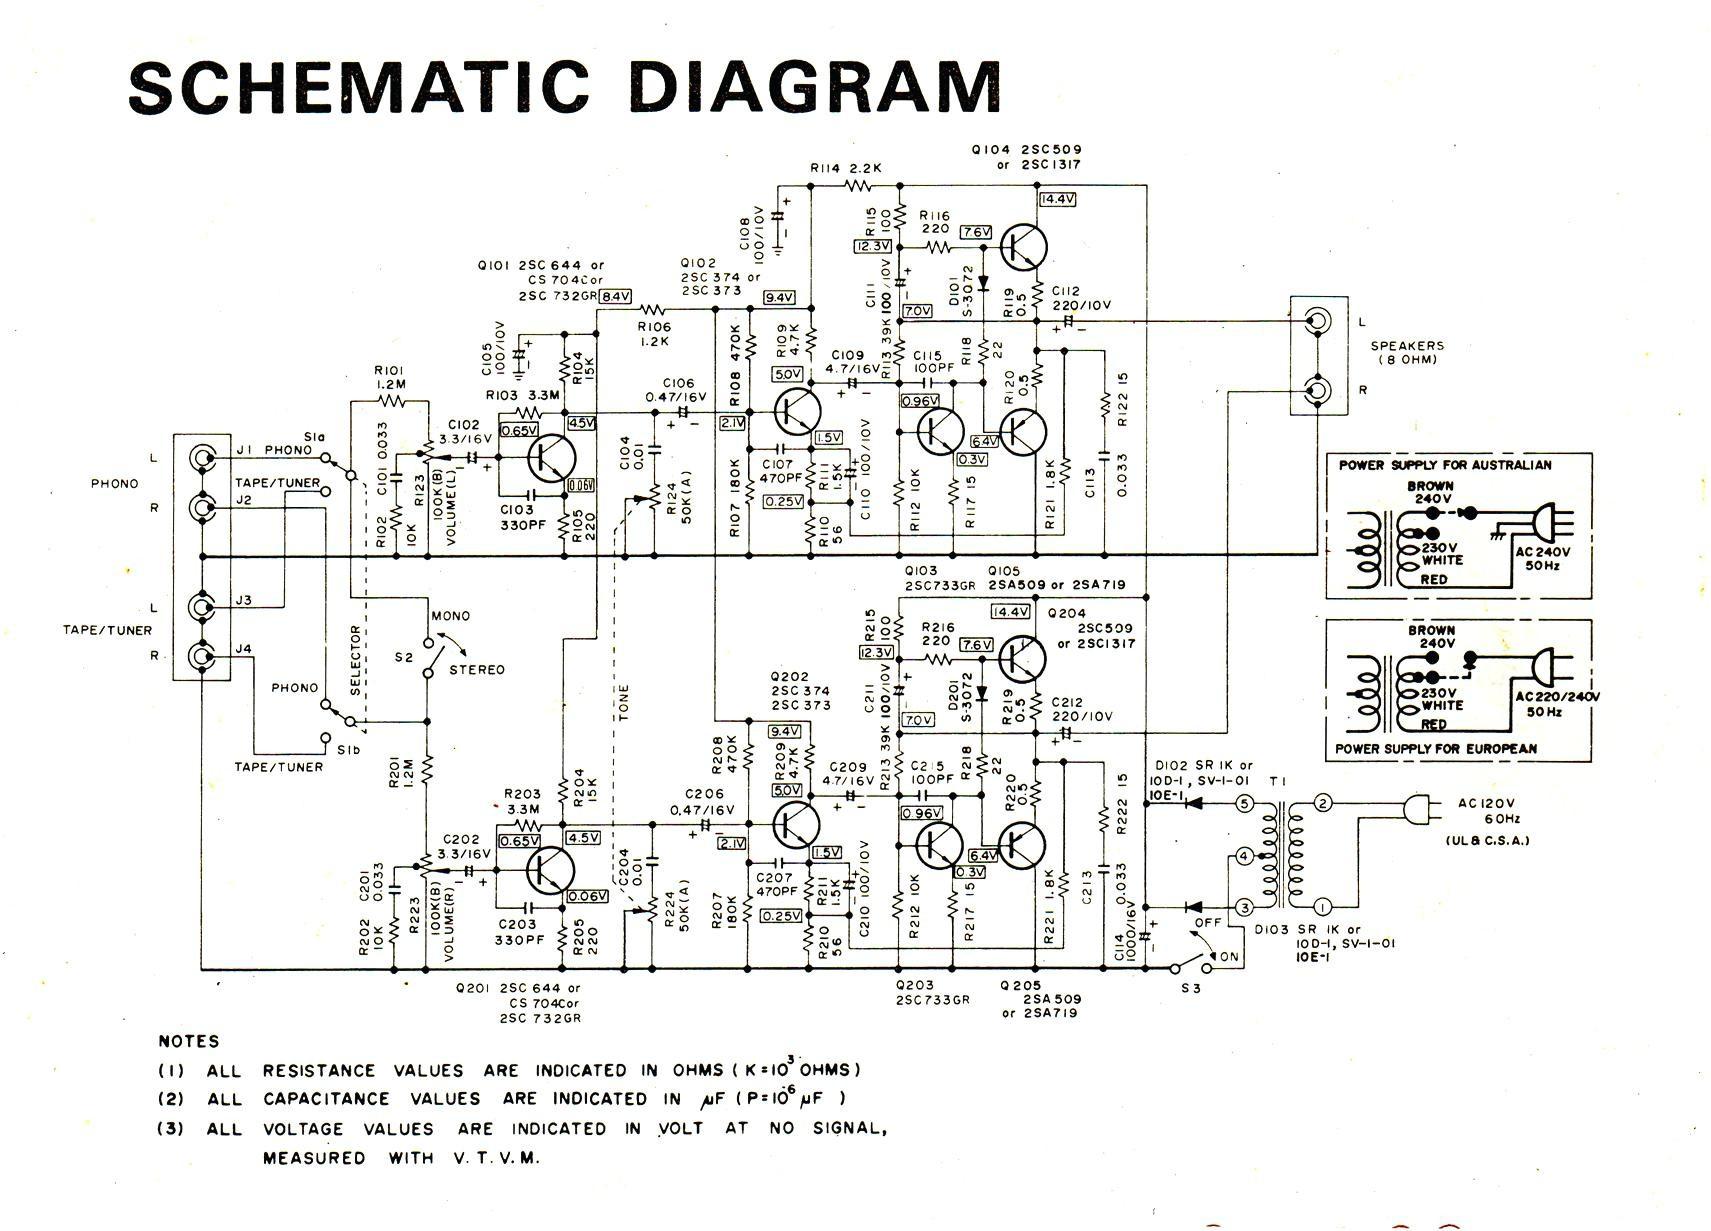 [DIAGRAM] 1998 Opel Astra Wiring Diagram FULL Version HD